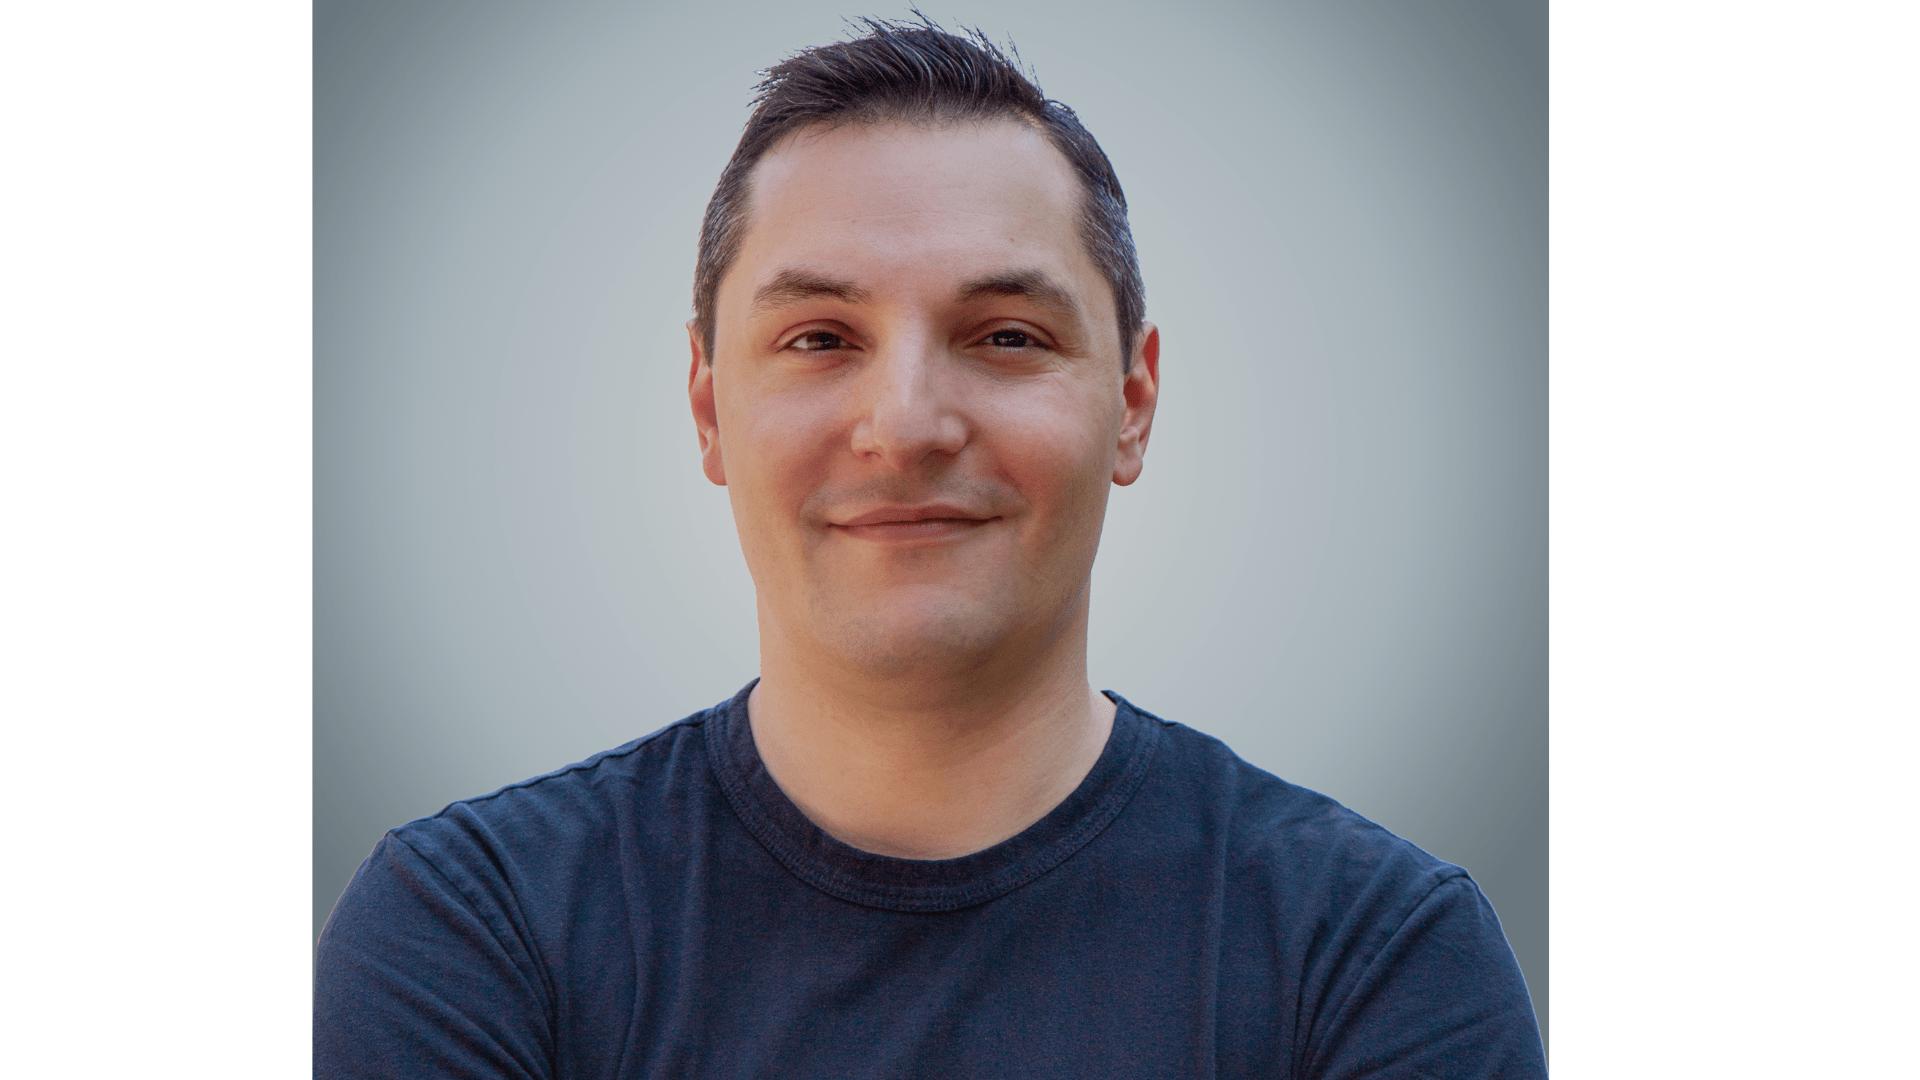 David Wachsman, founder and CEO, Wachsman